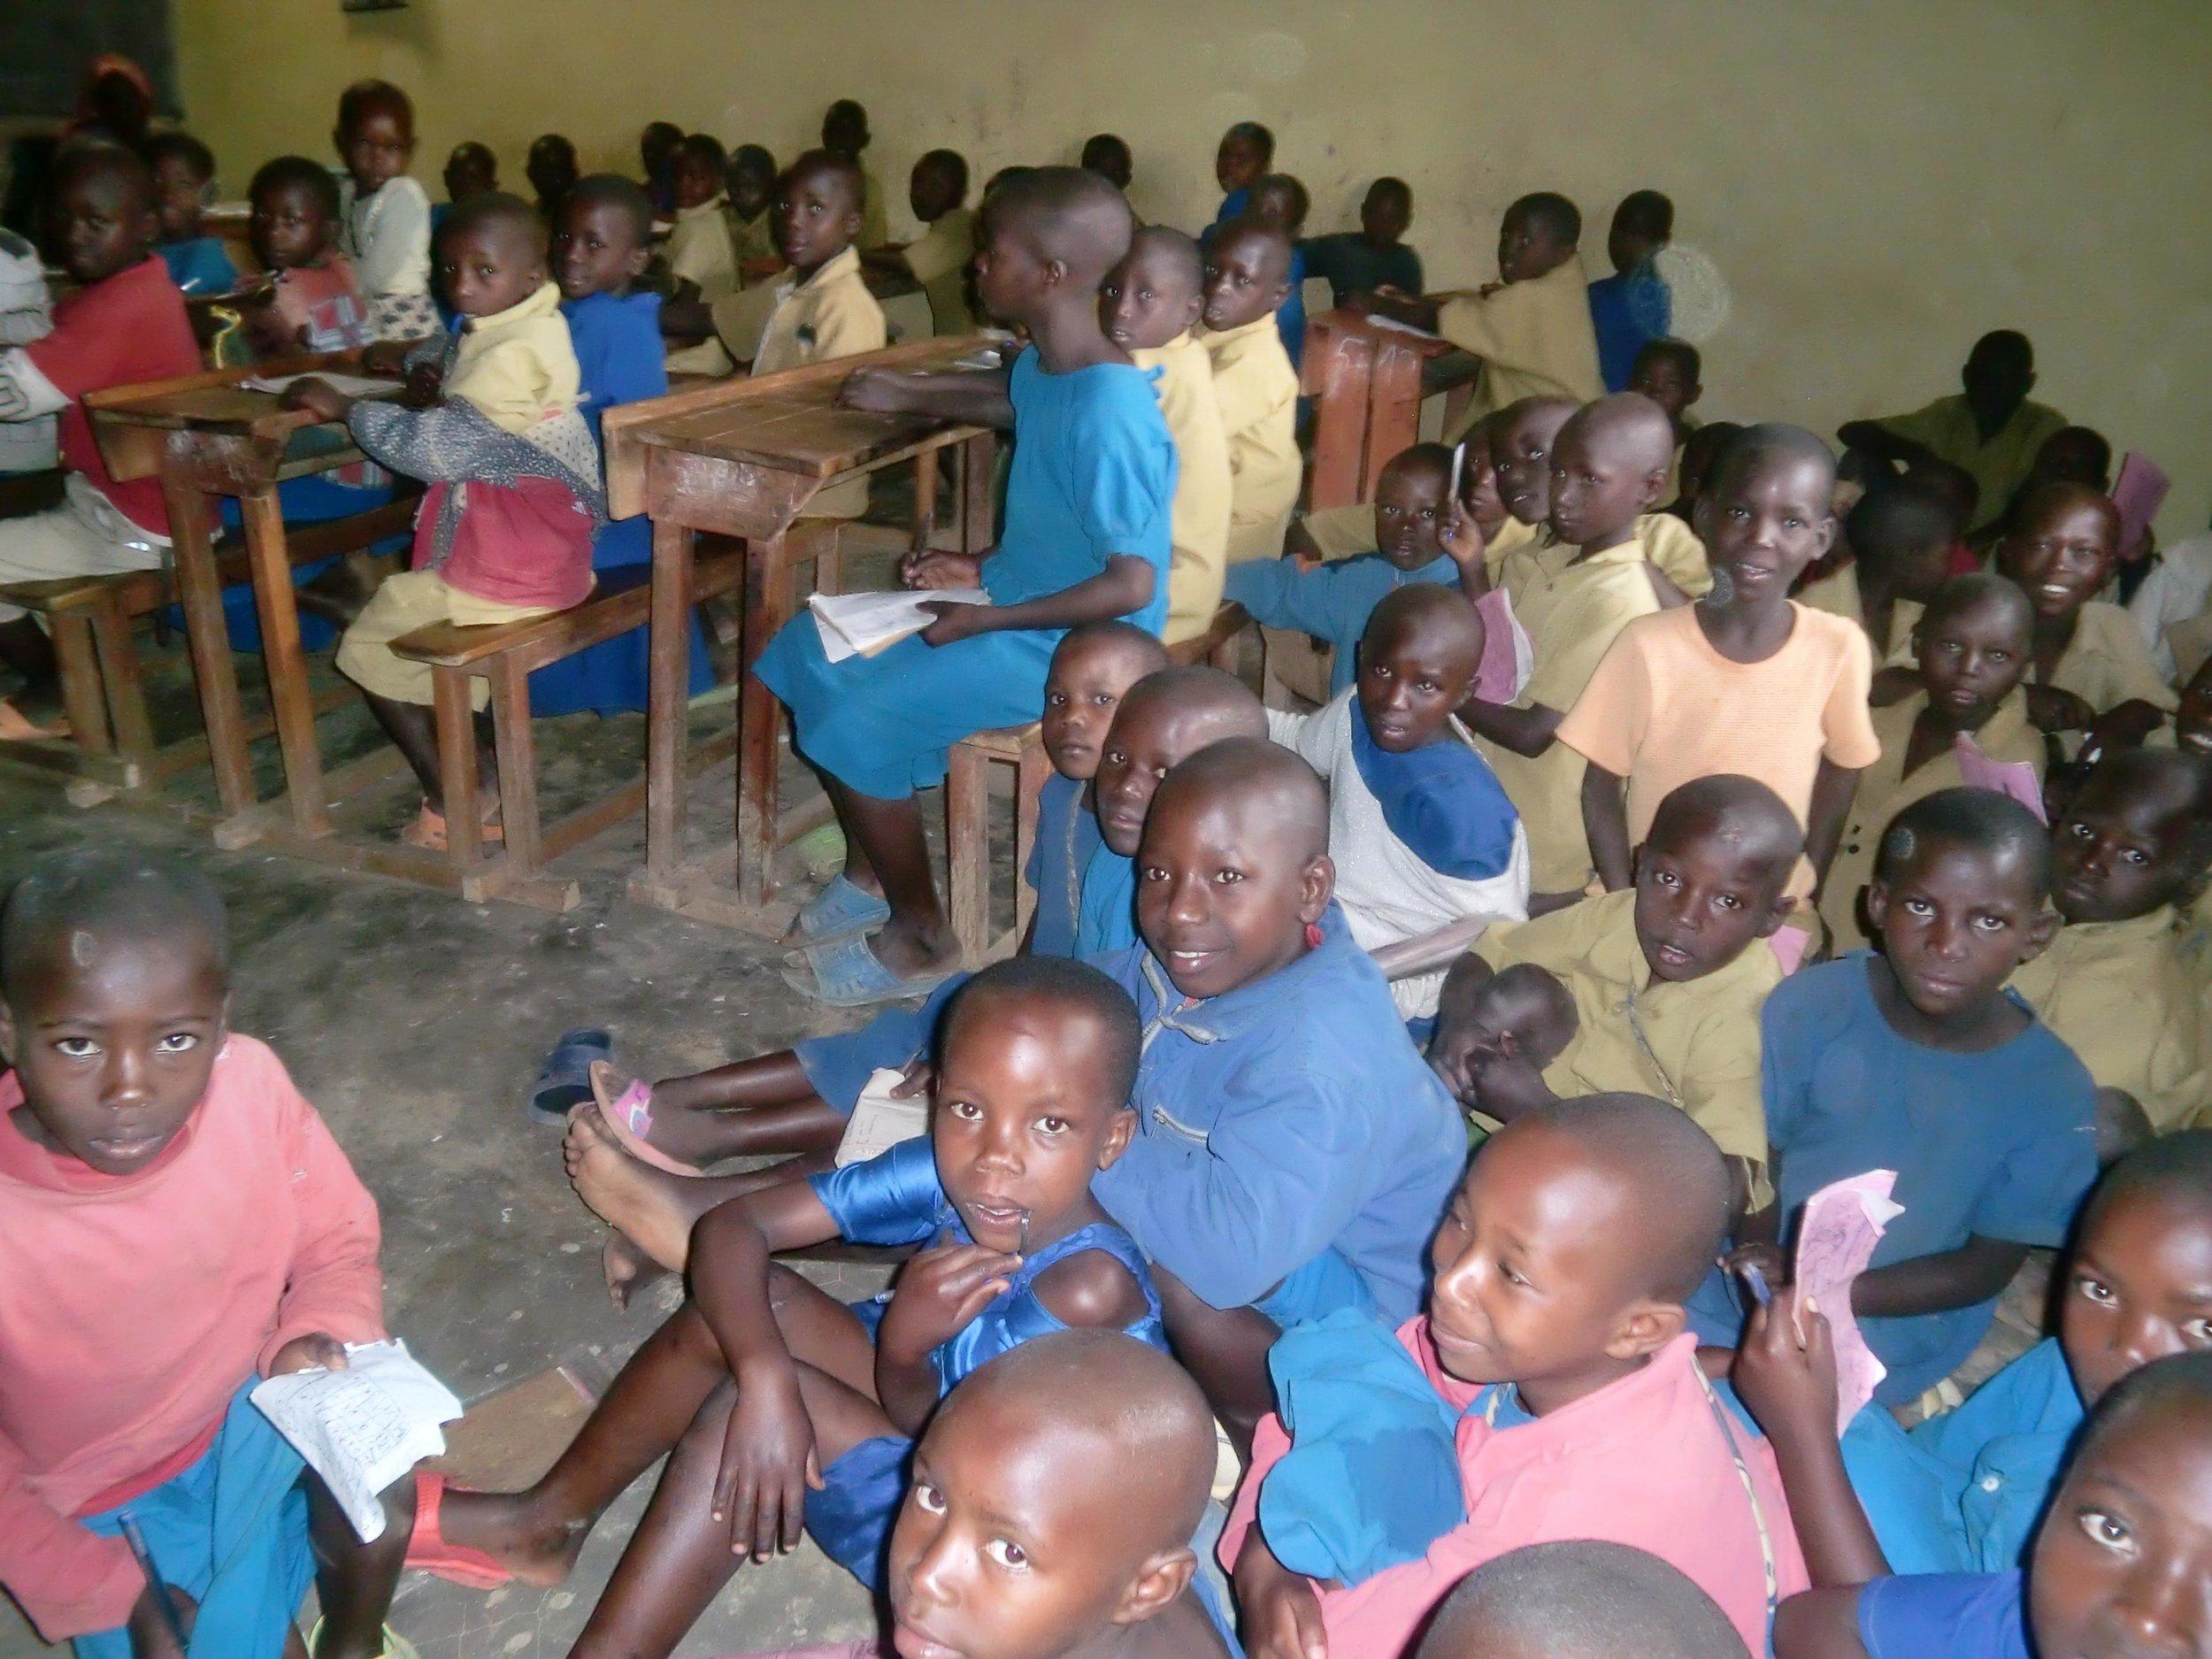 A typical classroom scene pre-TFS